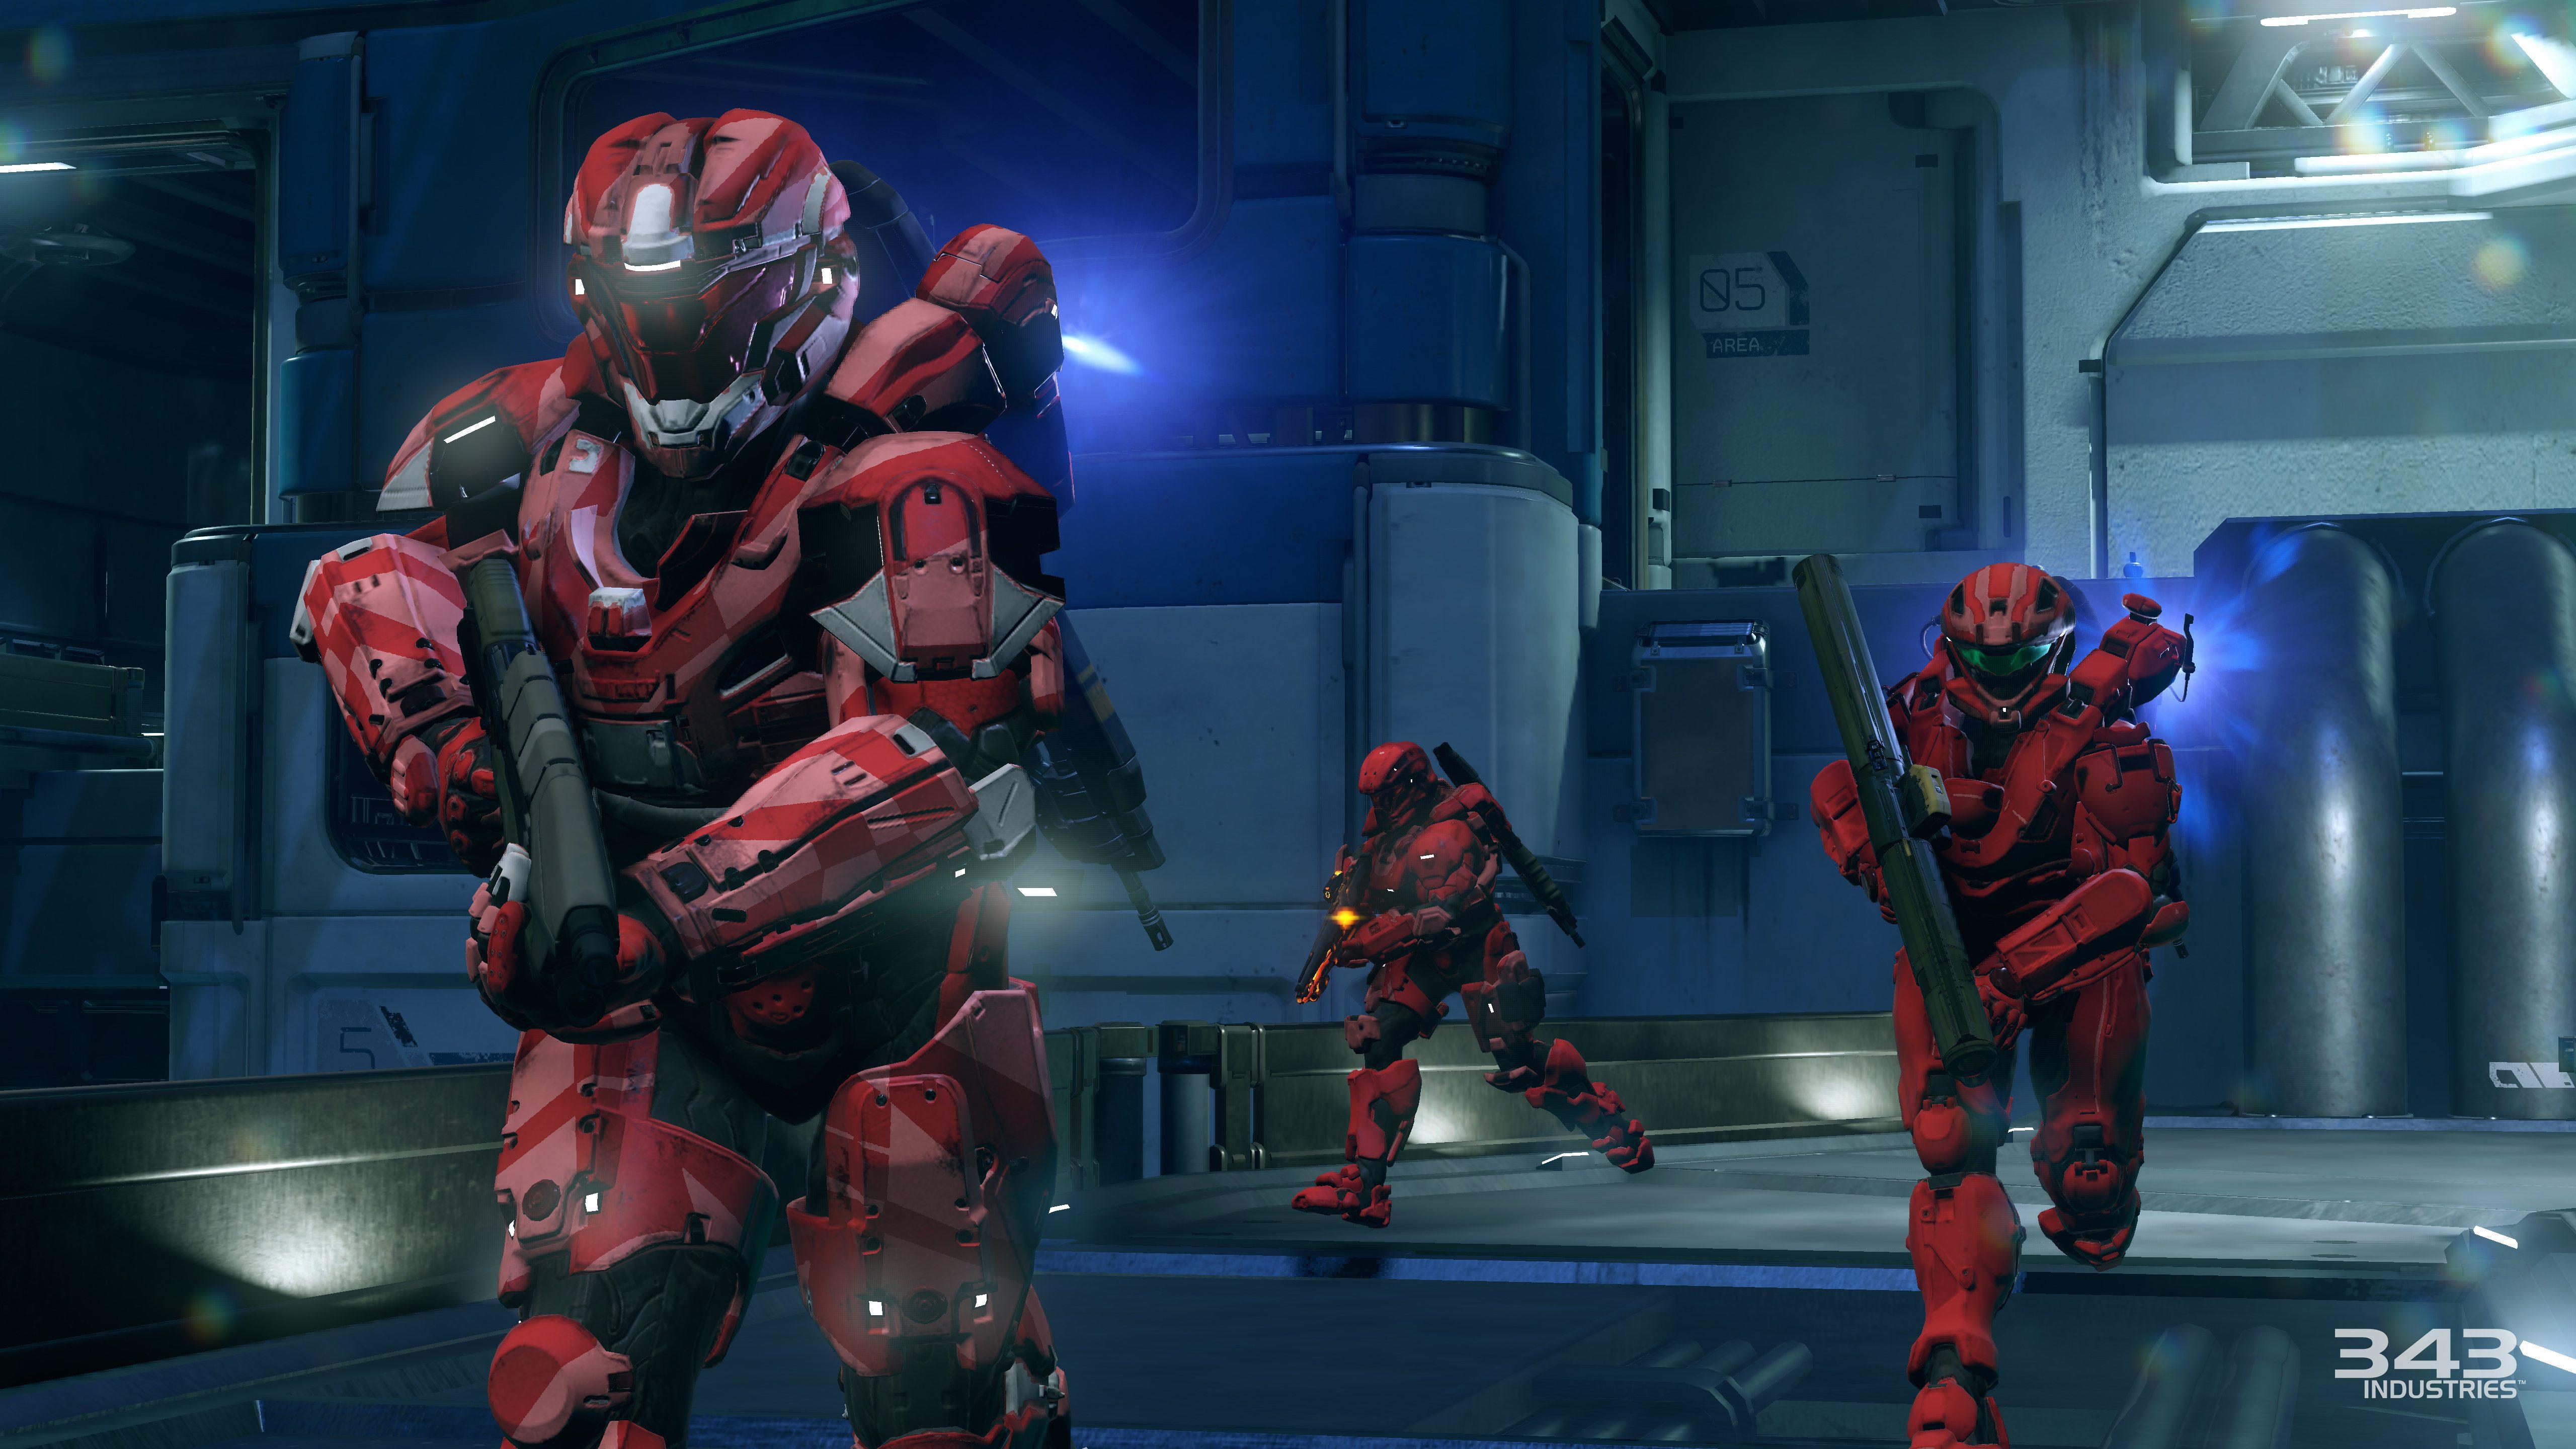 Halo-5-Guardians-Multiplayer-Beta-Empire-Fireteam.0